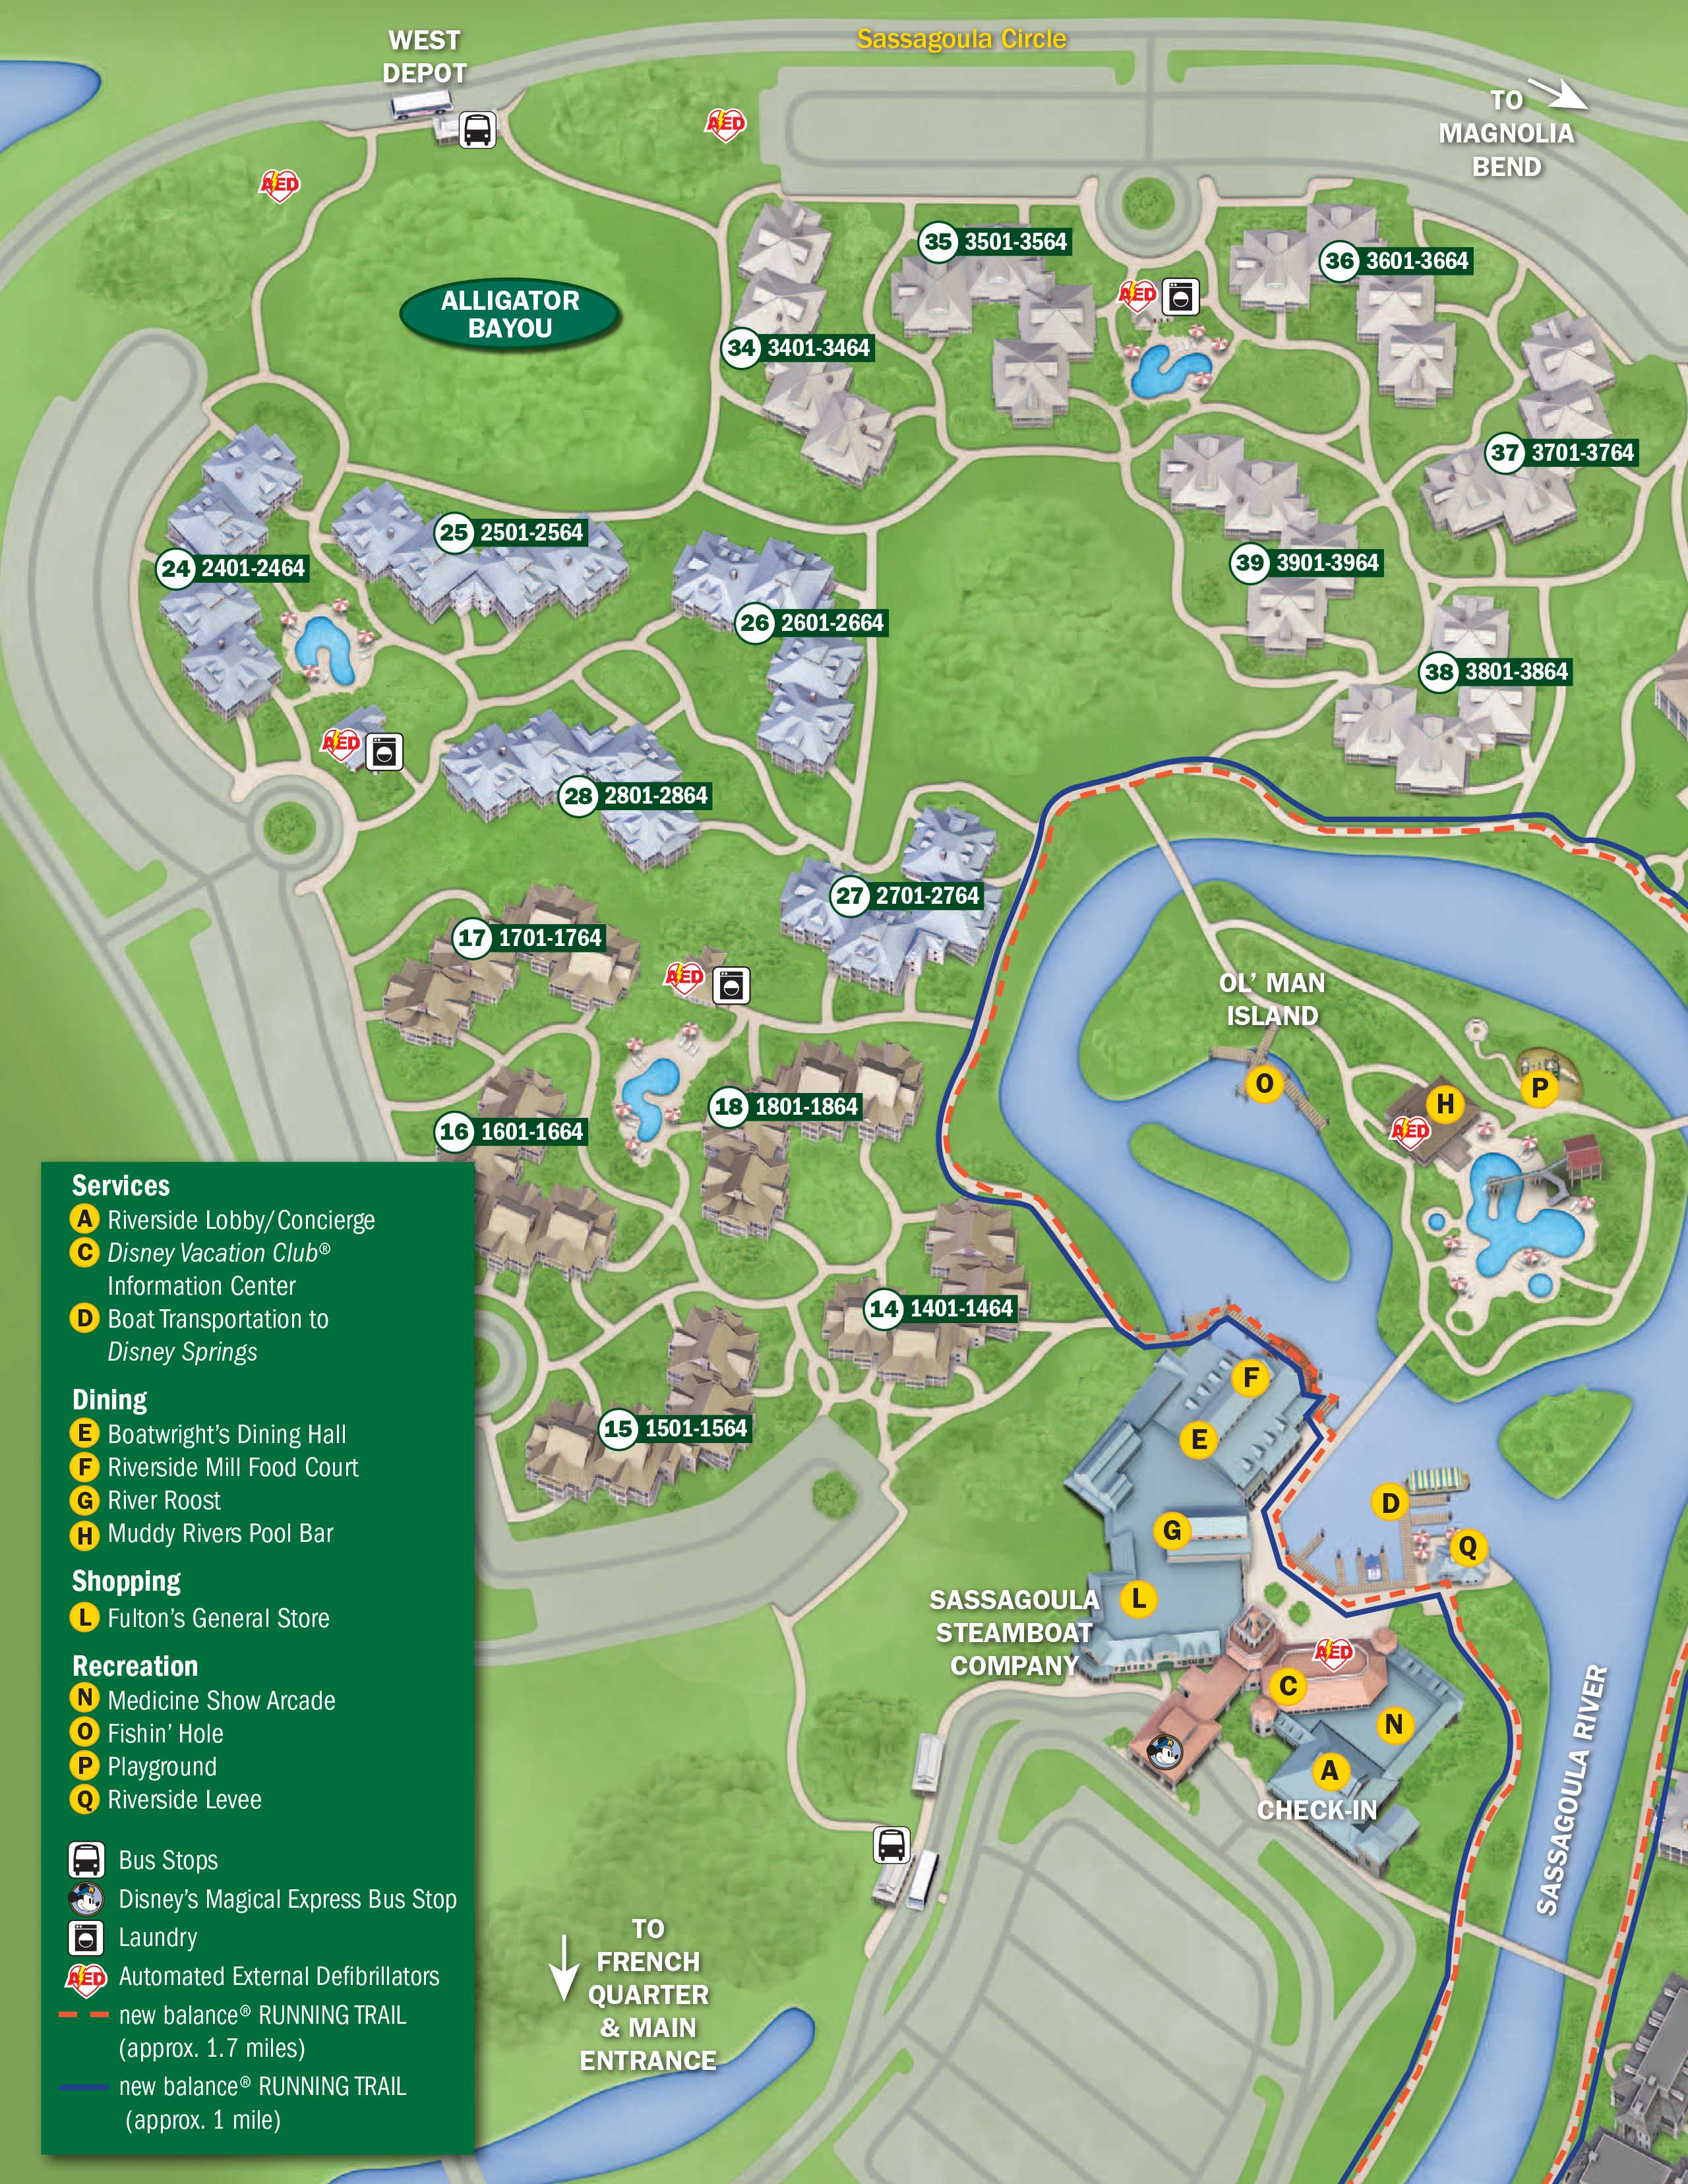 2017 Walt Disney World Resort Hotels Map